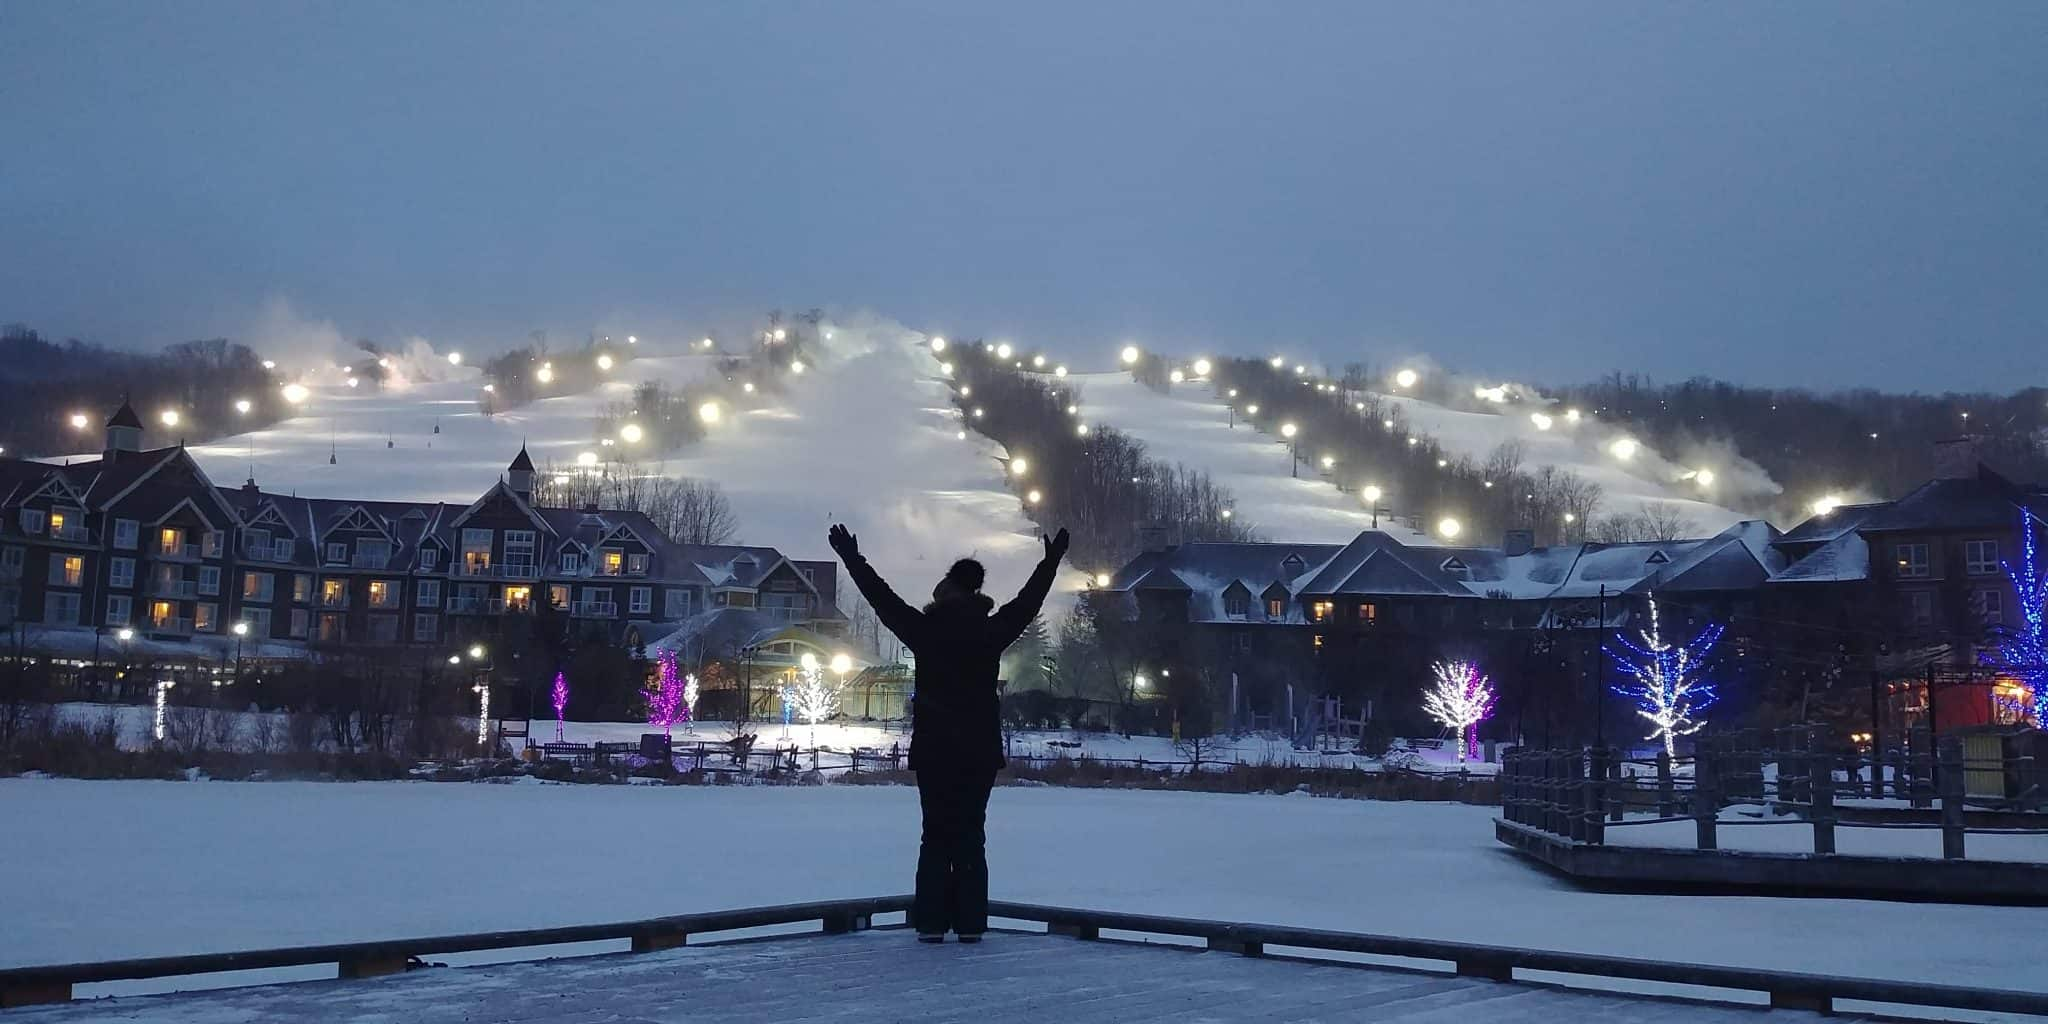 Blue Mountain Ontario Canada at night mountain ski hills with lights night skiing